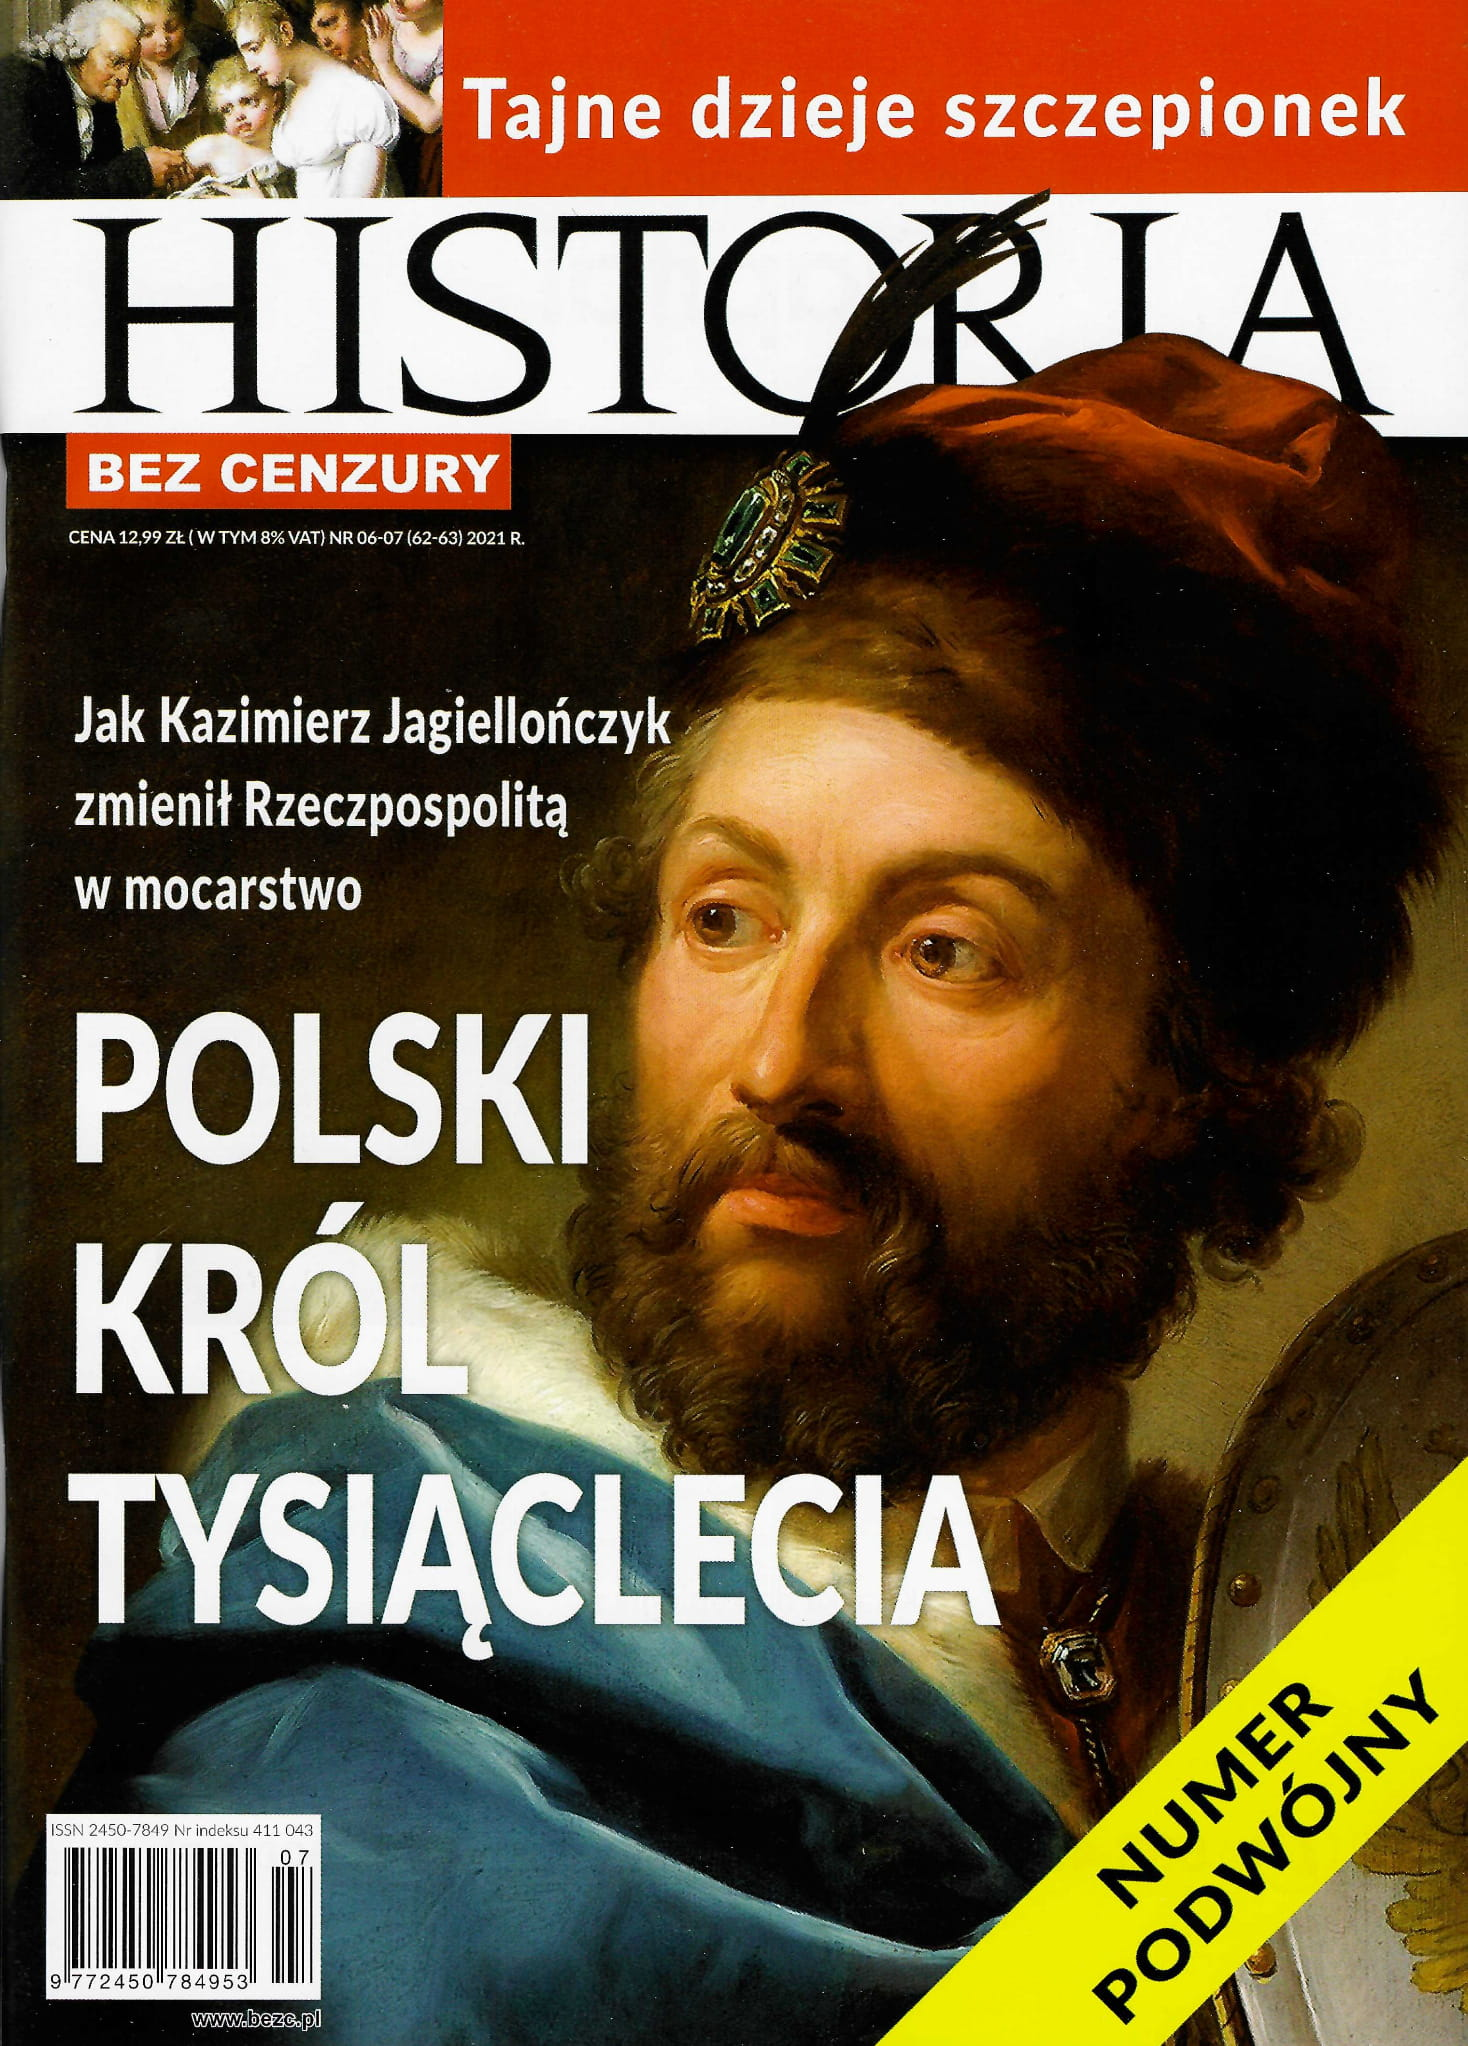 Image of Historia bez cenzury nr 06-07 (62-63) 2021 r.